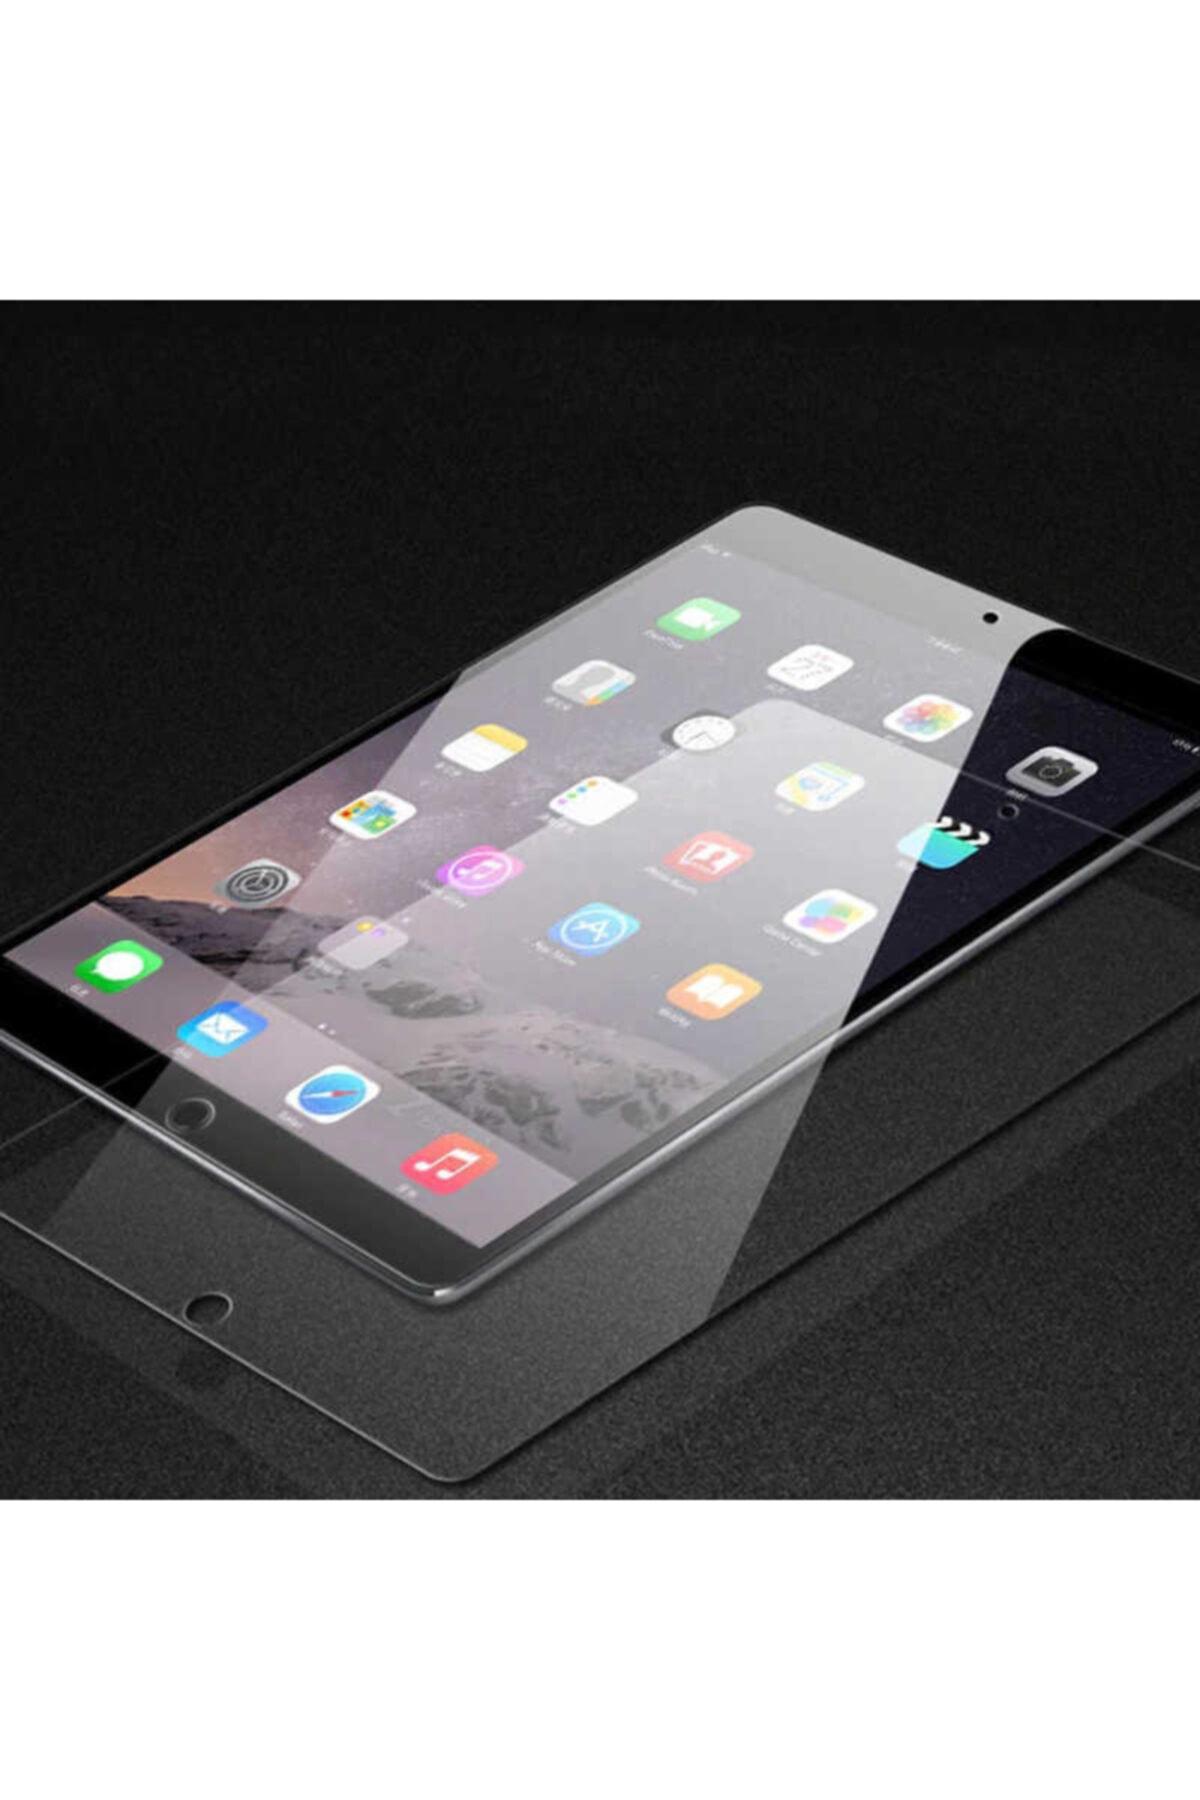 zore Apple New Ipad Pro 12.9 2018 Temperli Cam Ekran Koruyucu - 2